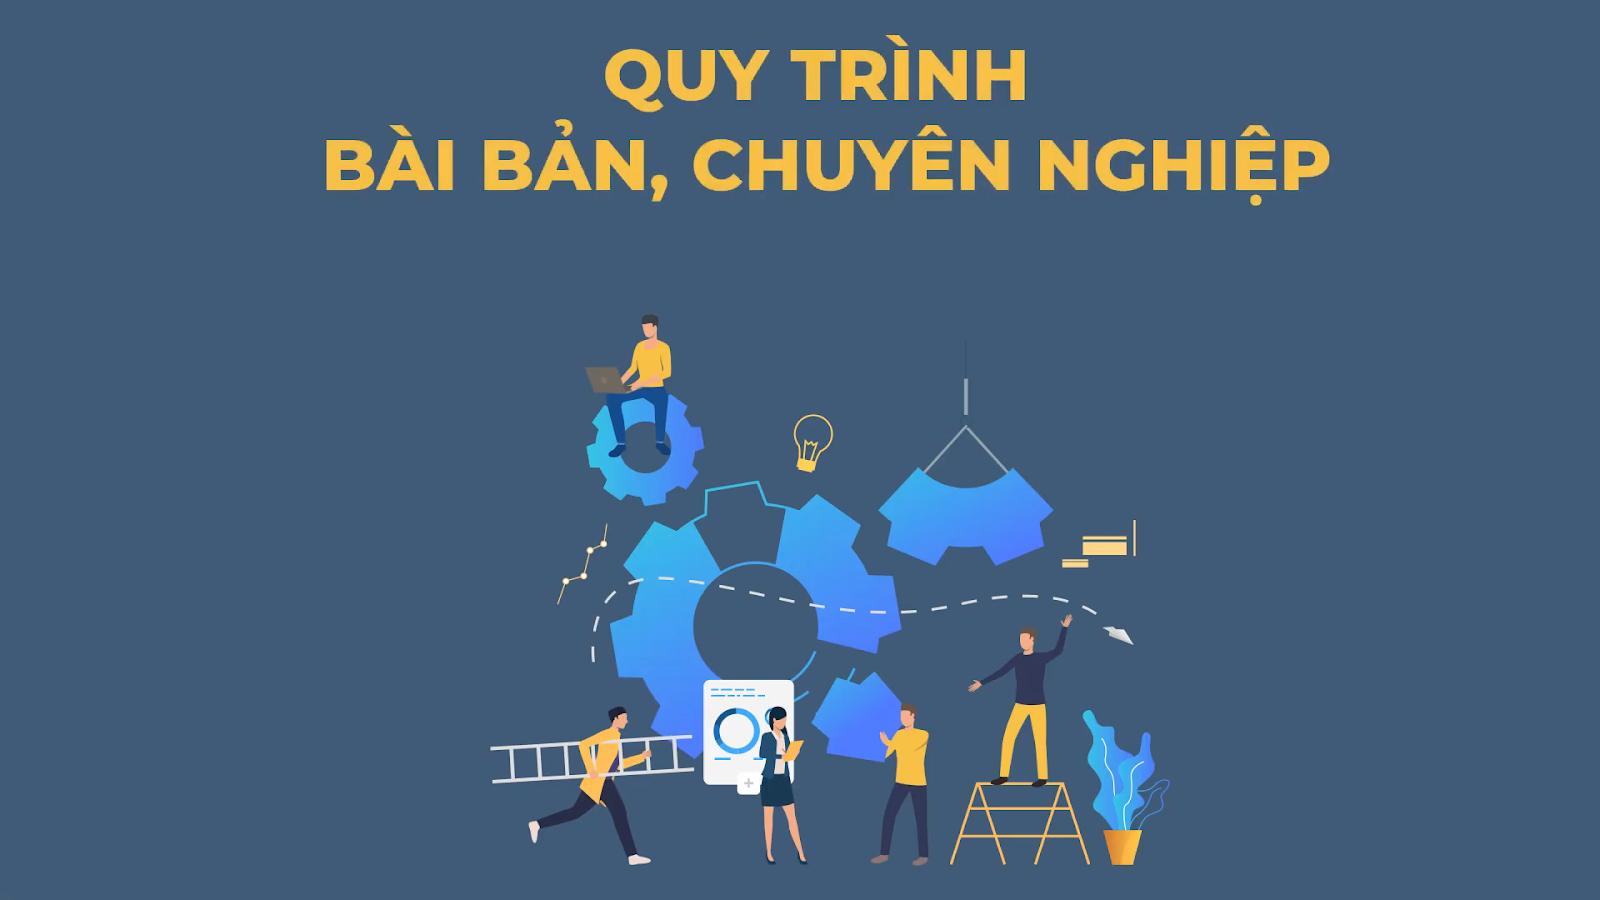 doi-ngu-marketing-bat-dong-san-ben-ngoai-se-so-huu-quy-trinh-lam-viec-bai-ban-chuyen-nghiep-hon